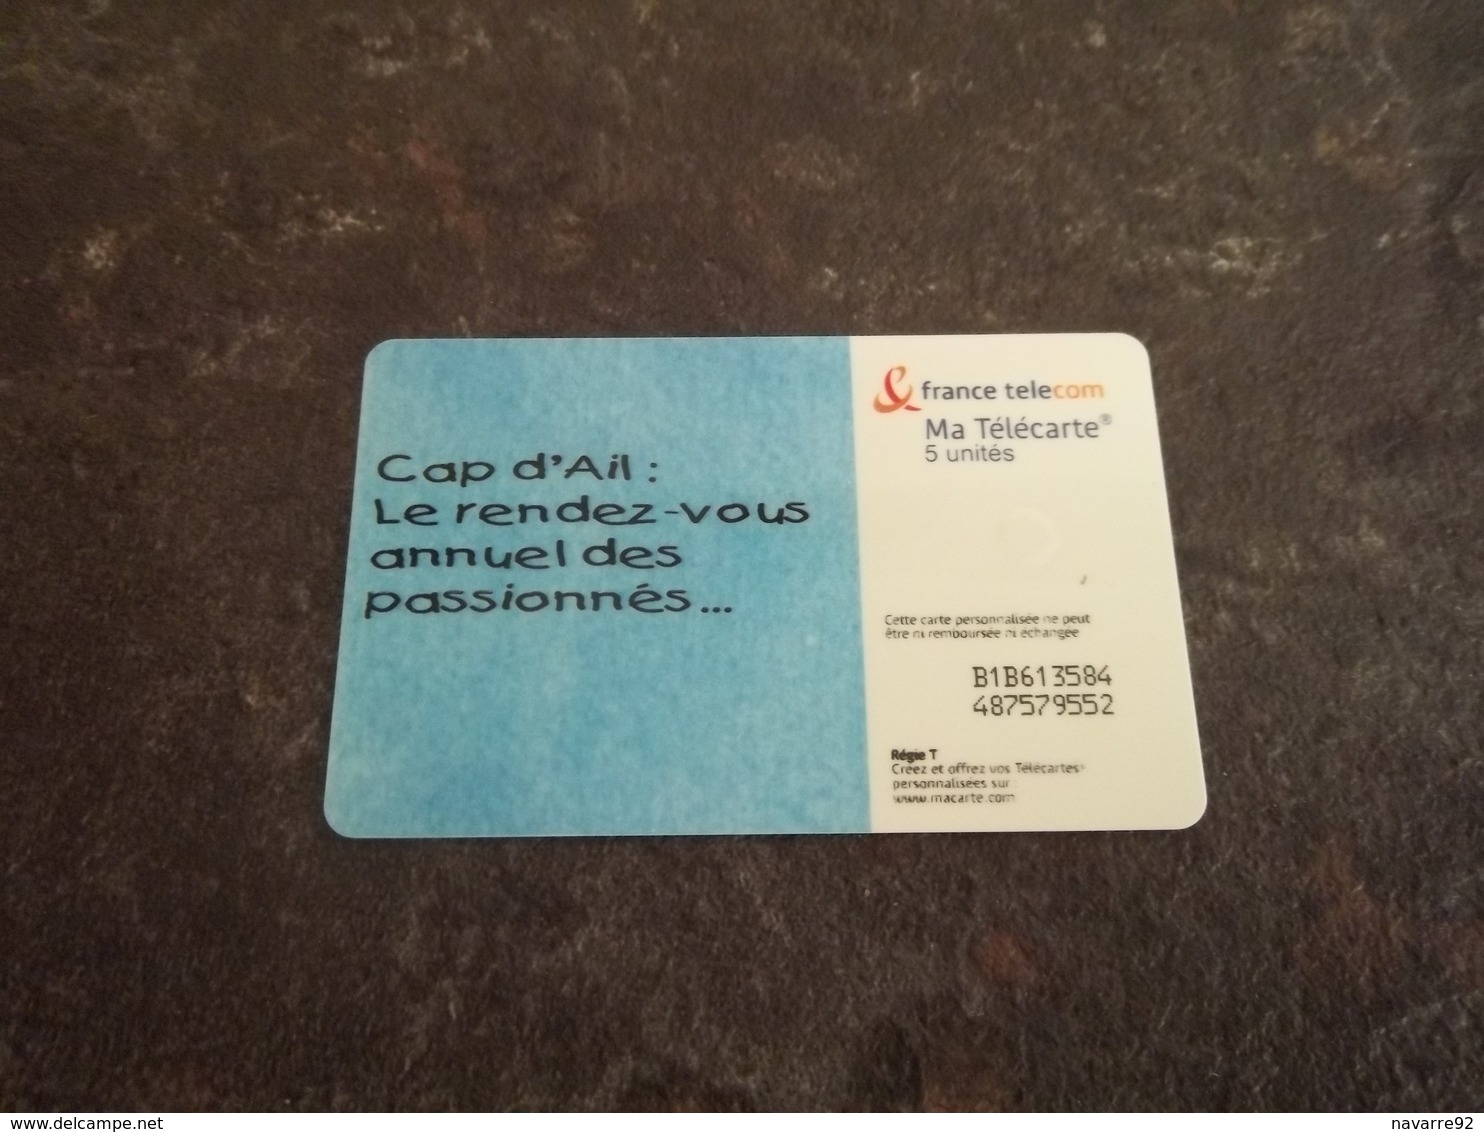 "TELECARTE ""MA TELECARTE"" CAP D'AIL 5 UNITES RARE !!! - France"